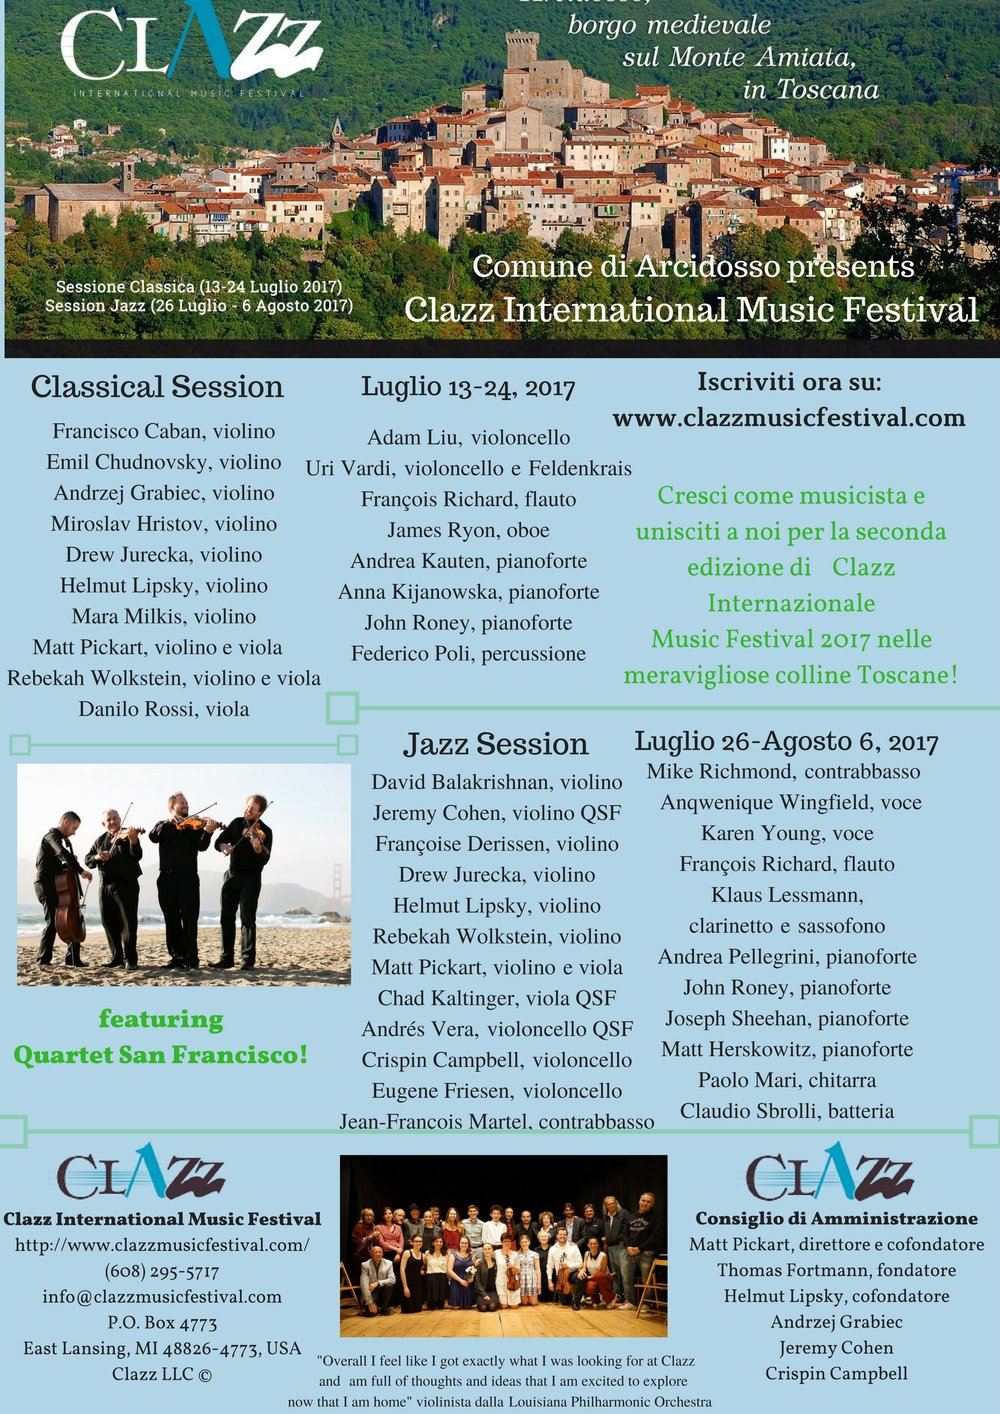 Clazz Italian Poster.jpg